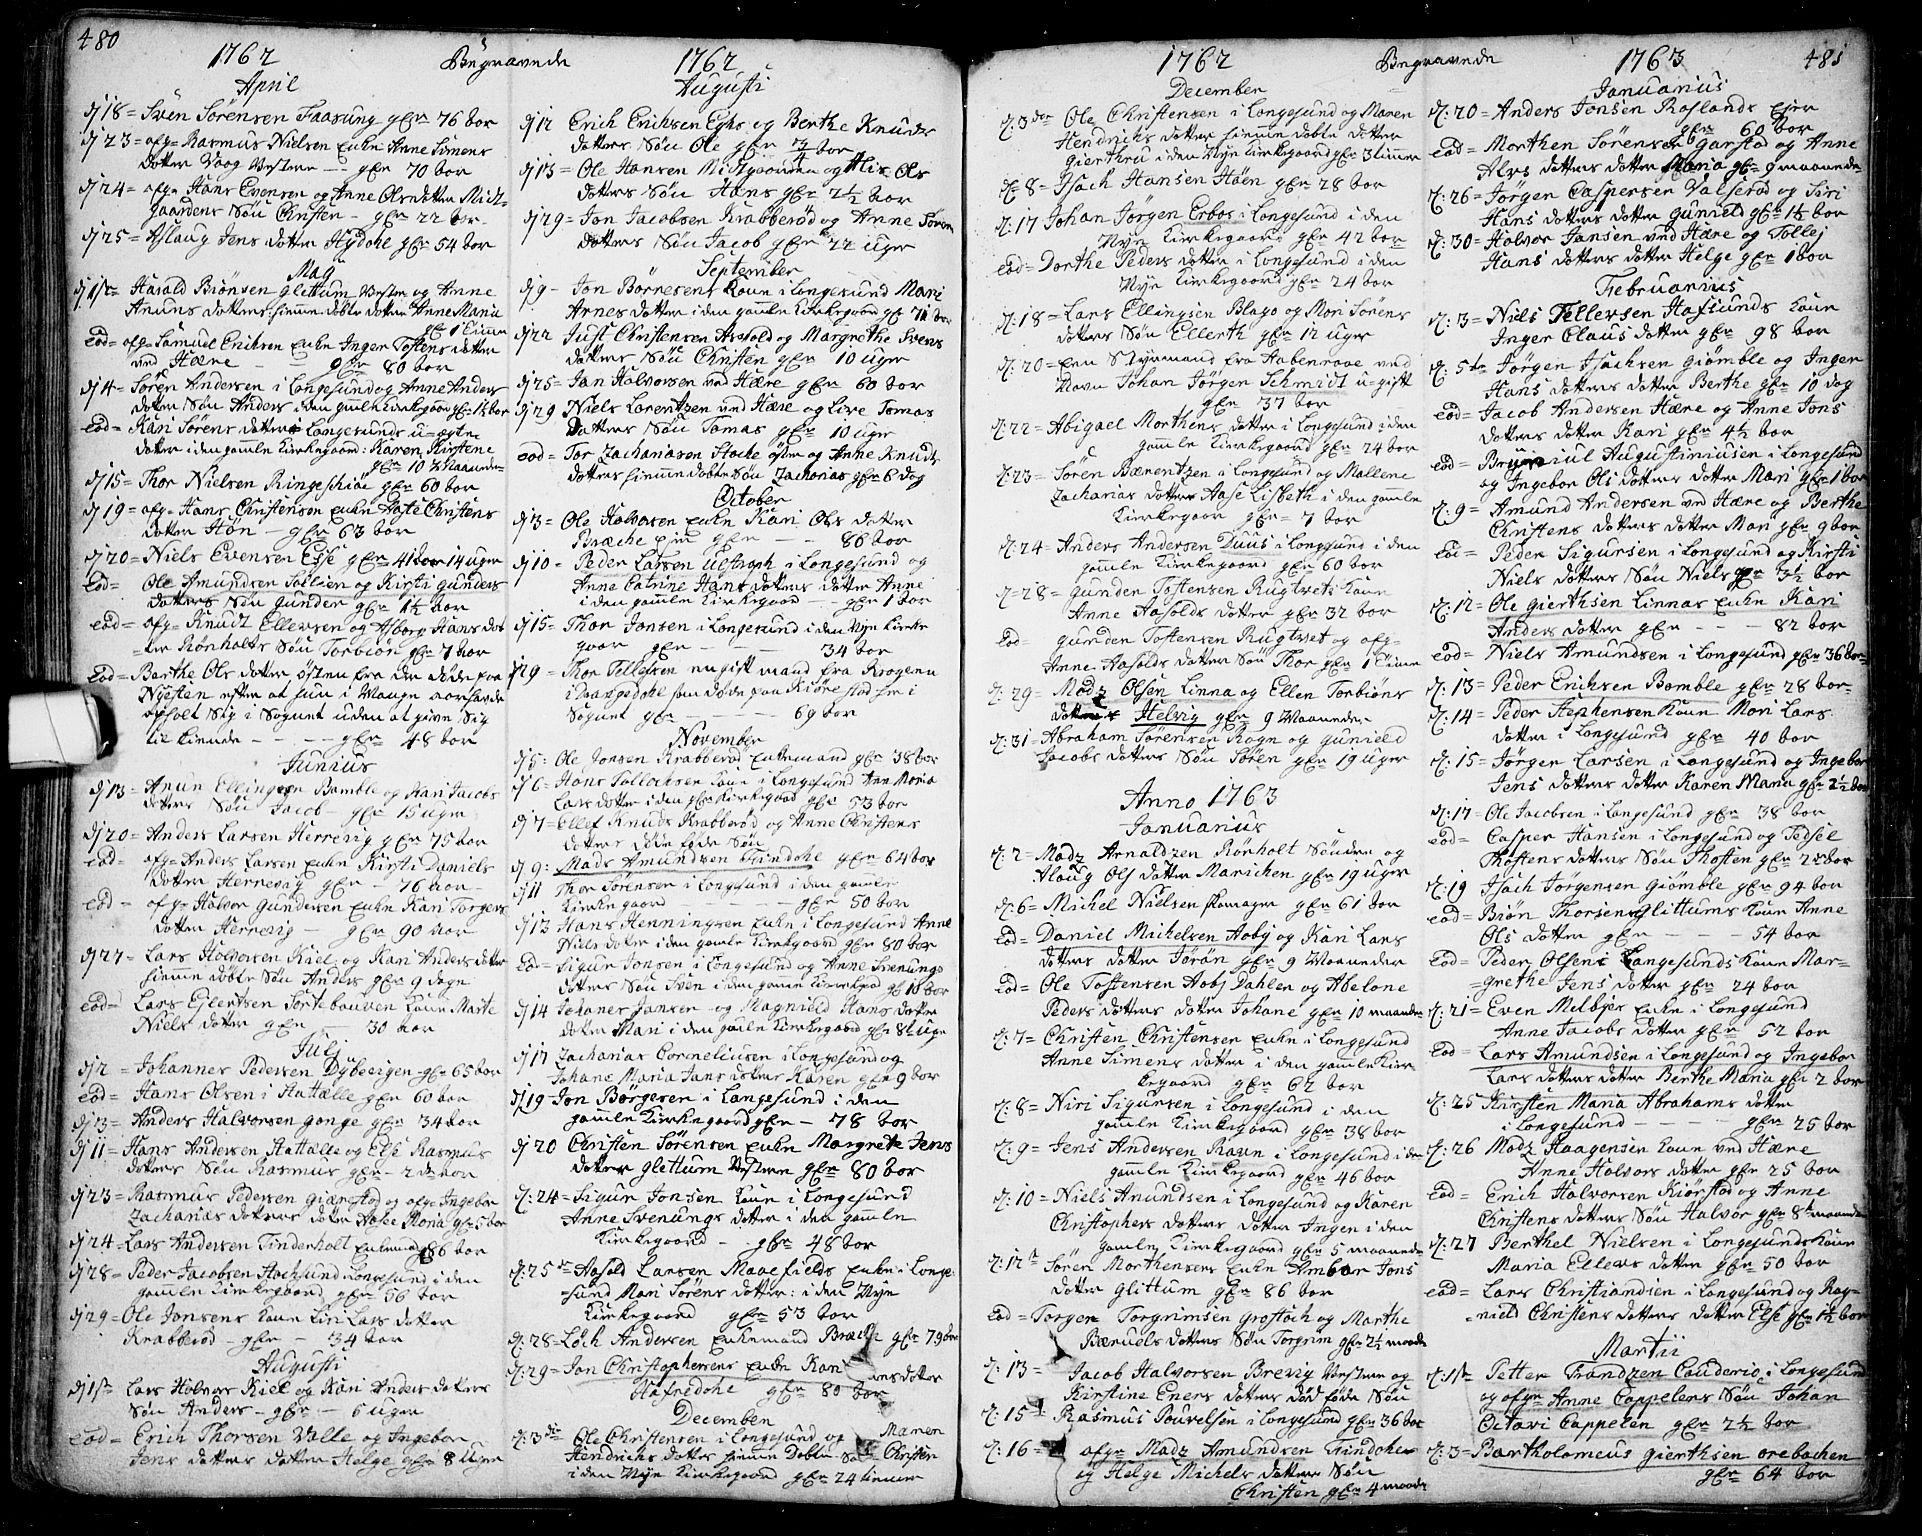 SAKO, Bamble kirkebøker, F/Fa/L0001: Ministerialbok nr. I 1, 1702-1774, s. 480-481